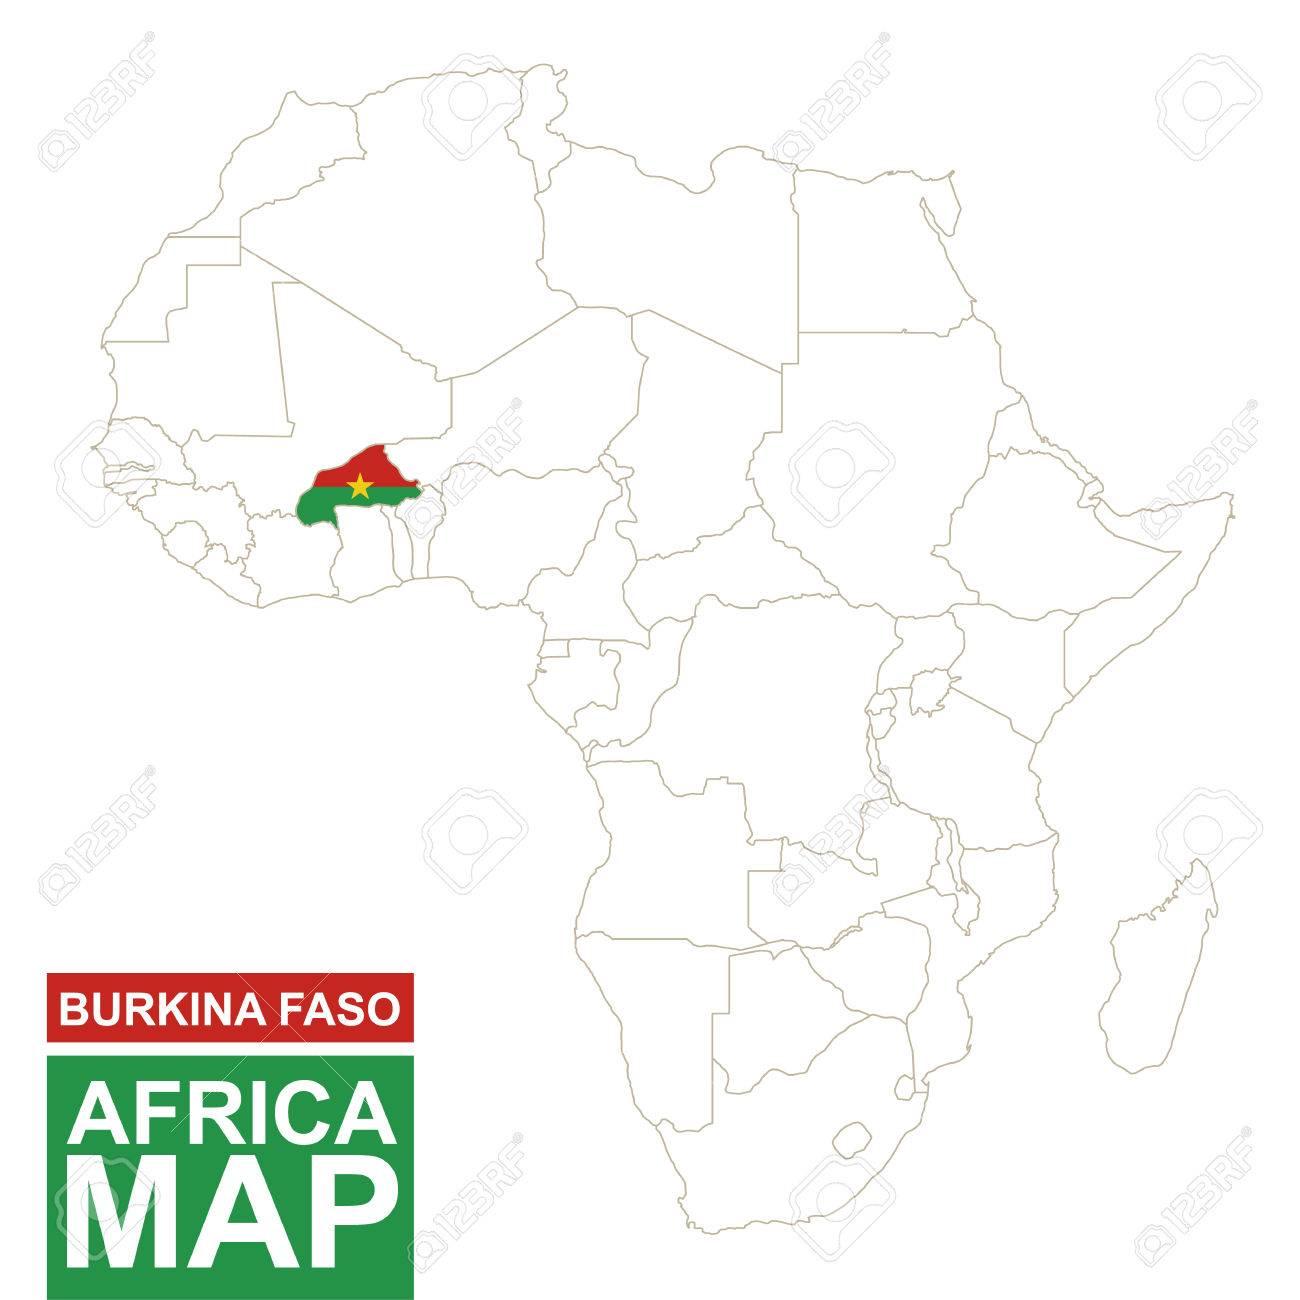 Africa Contoured Map With Highlighted Burkina Faso Burkina Faso